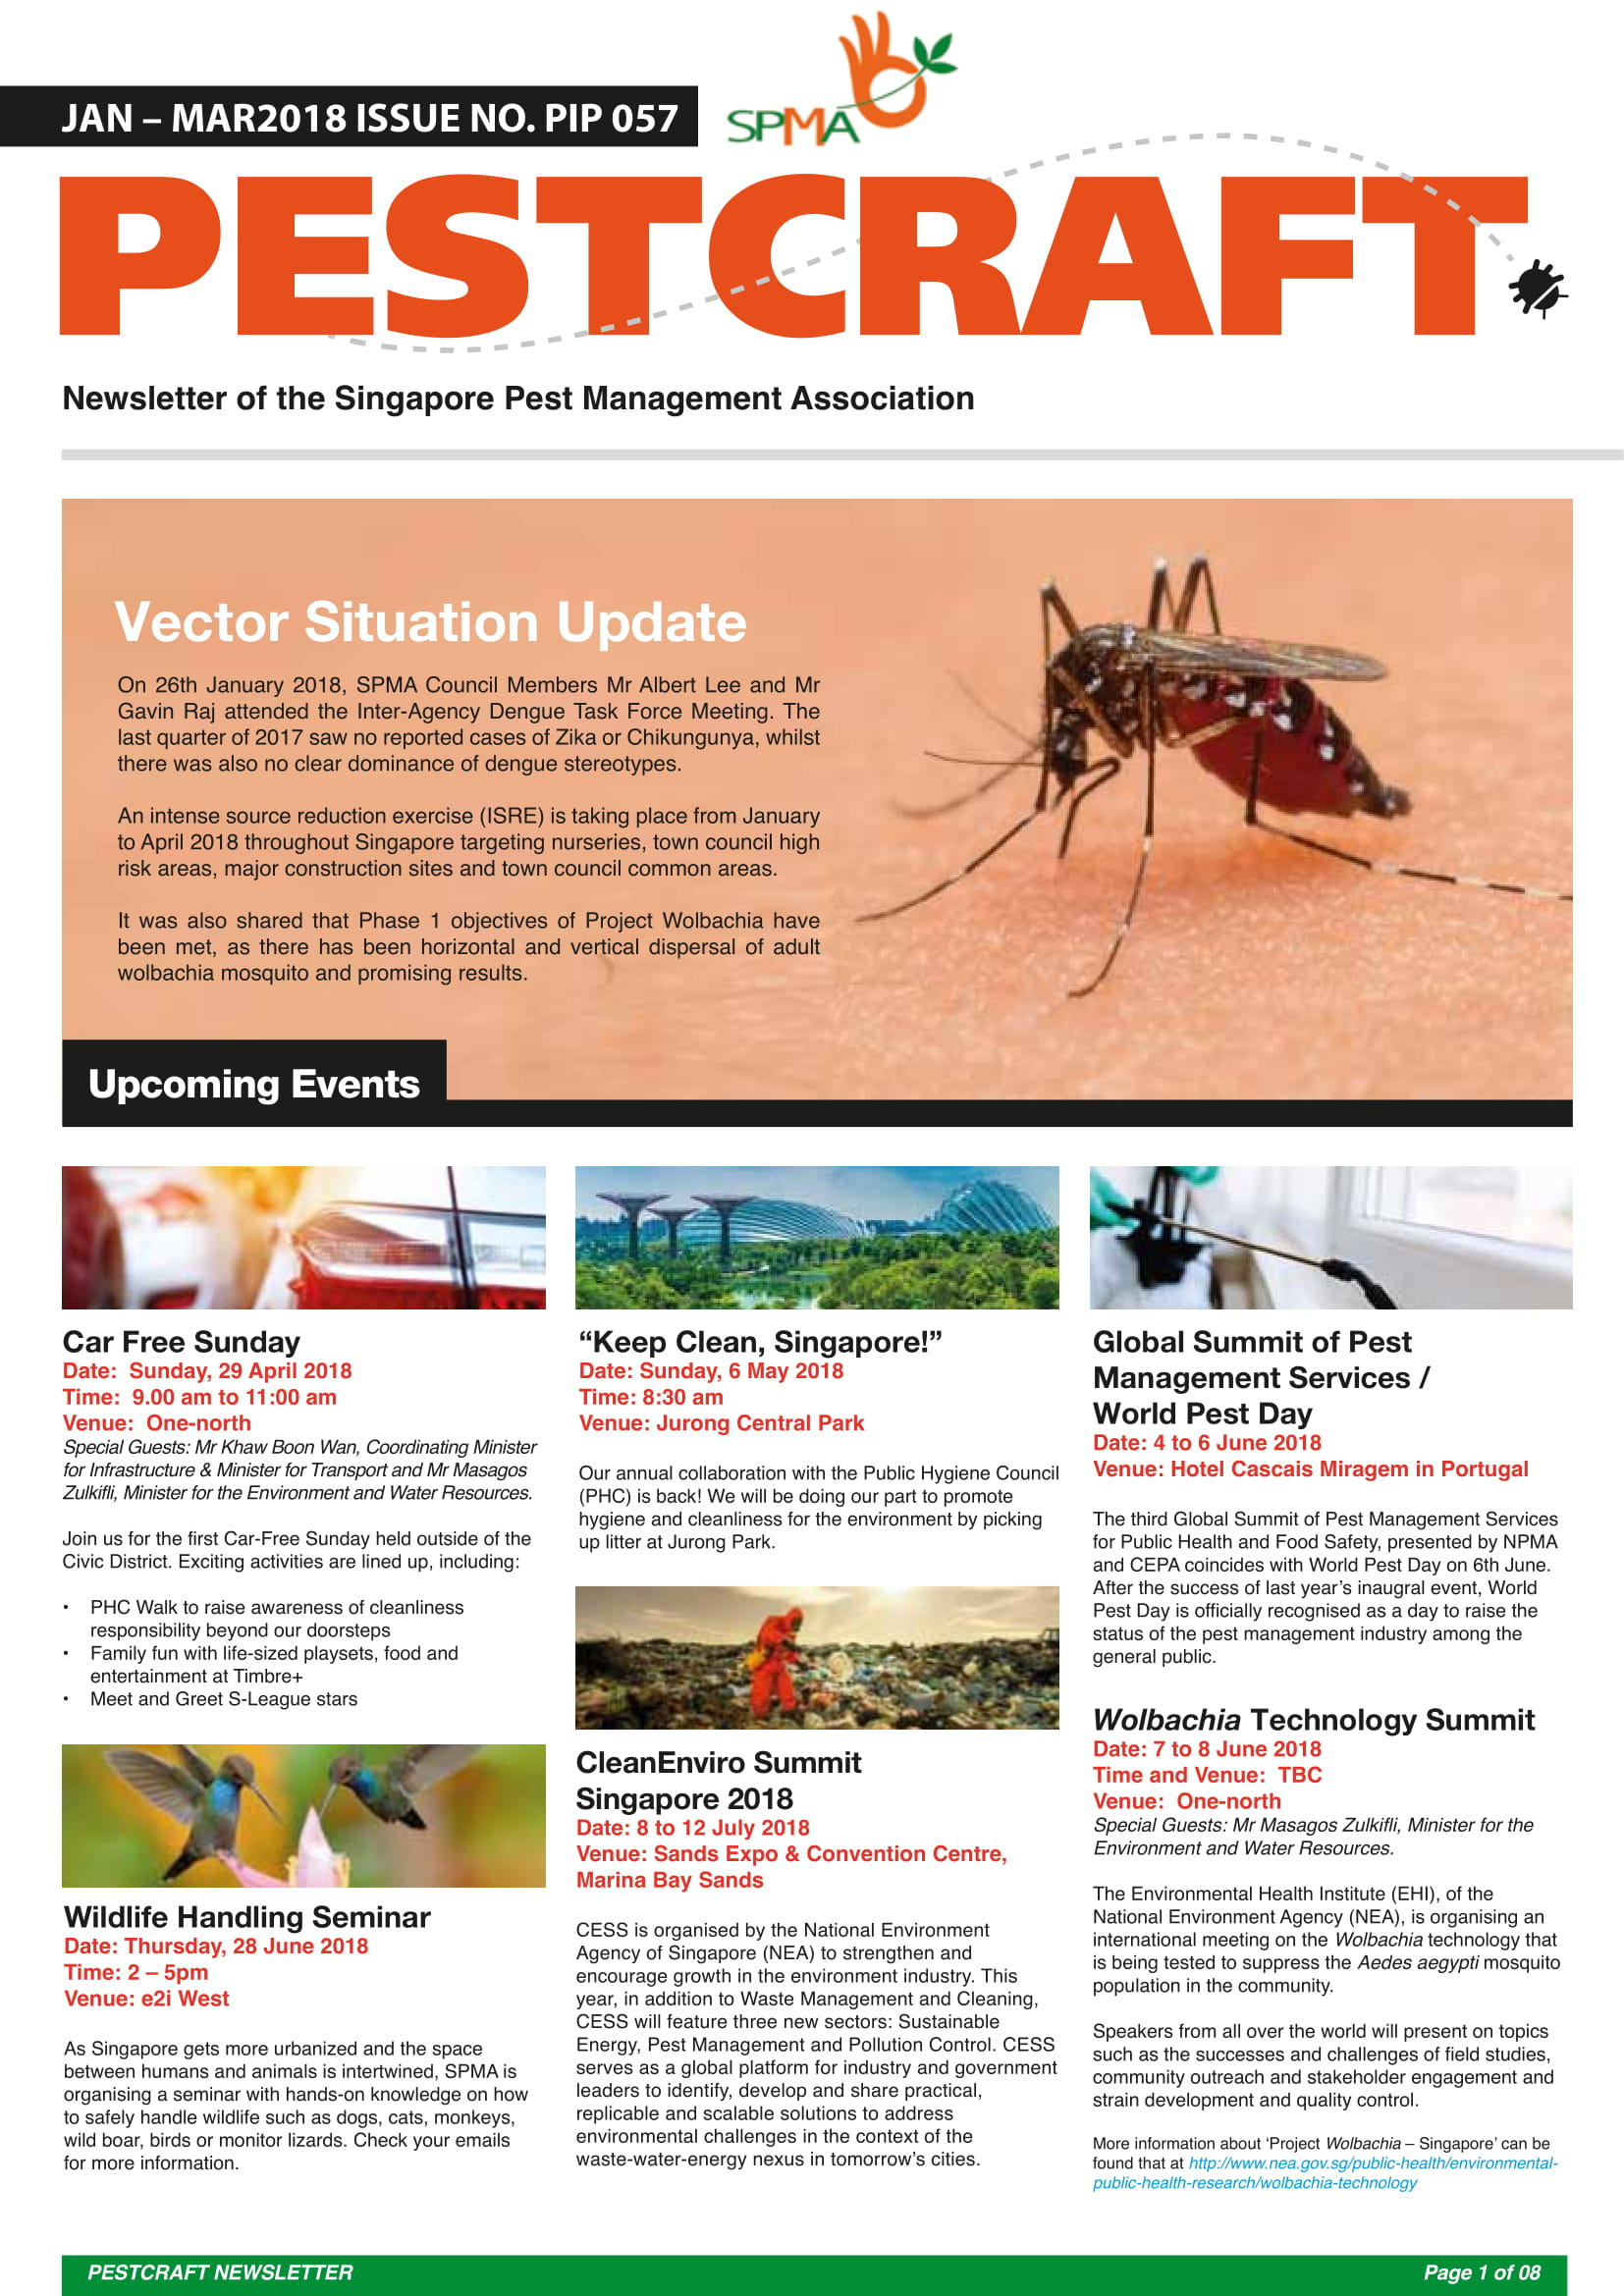 pestcraft_issue4-jan2018_webversion-1.jpg